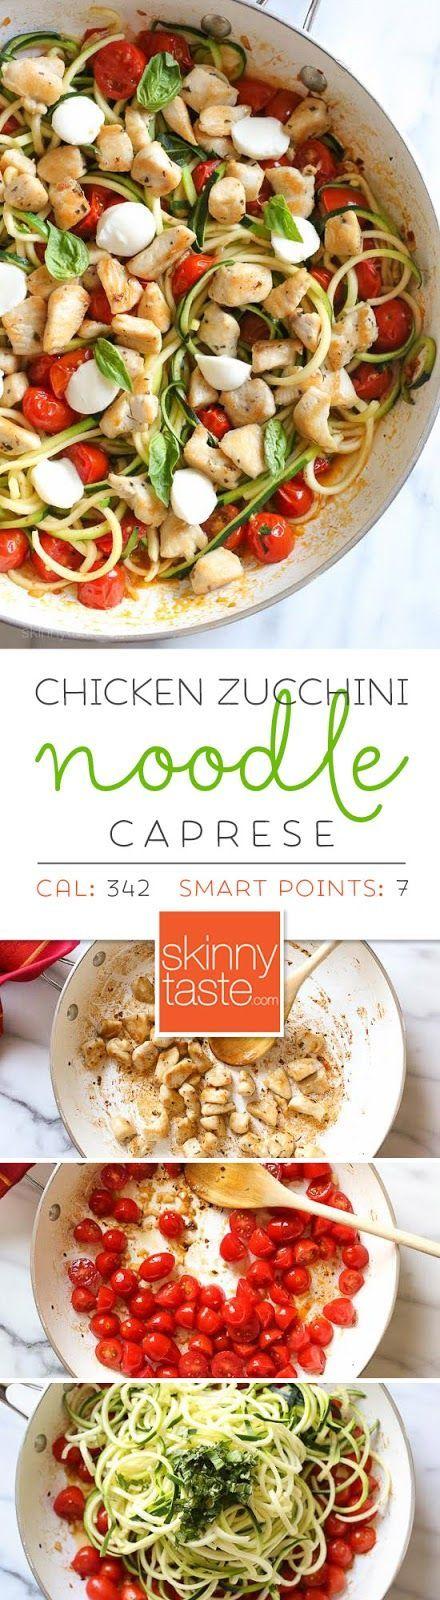 Chicken Zucchini Noodle Caprese - 2 servings at 342 cals, 17 grams fat, 34 grams protein, 15 grams carbs, 4 grams fiber, 2 grams sugar